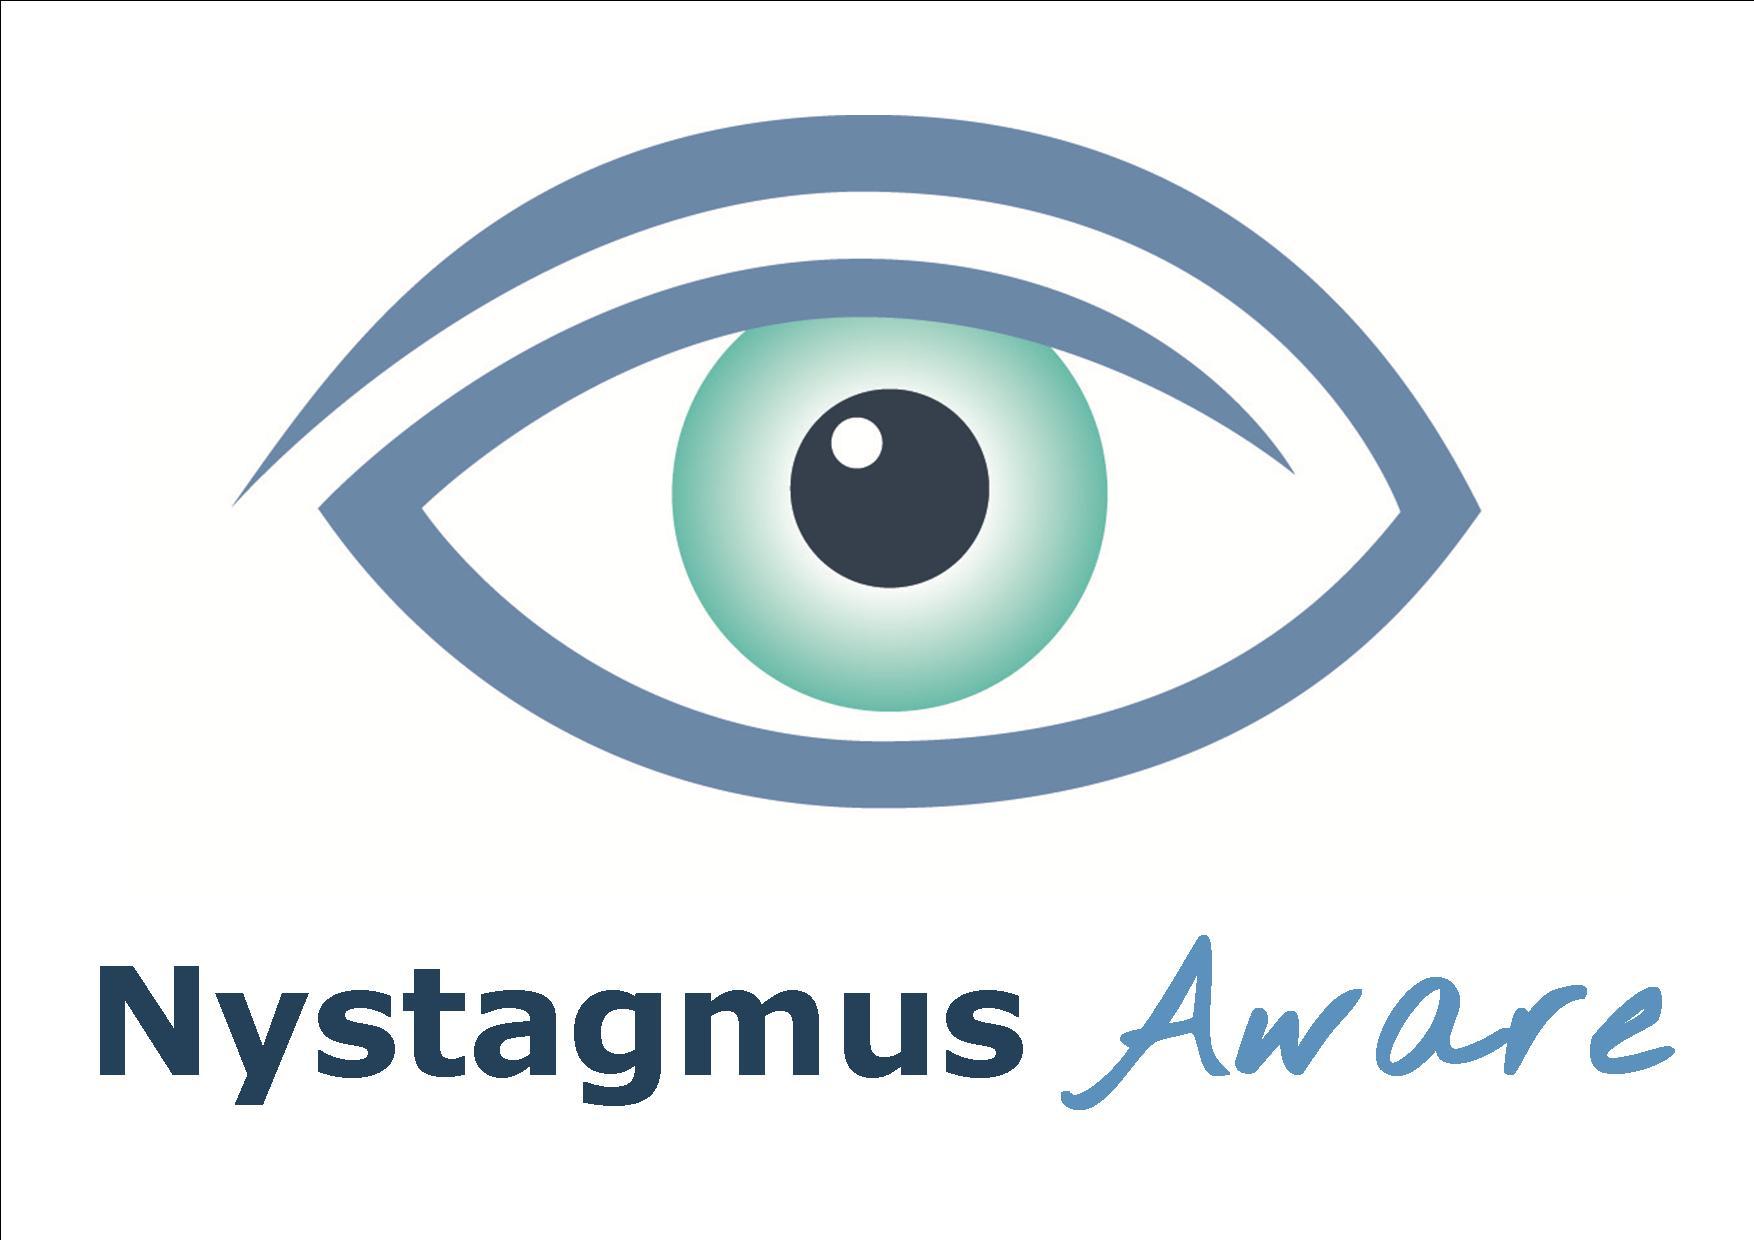 Nystagmus Aware logo.